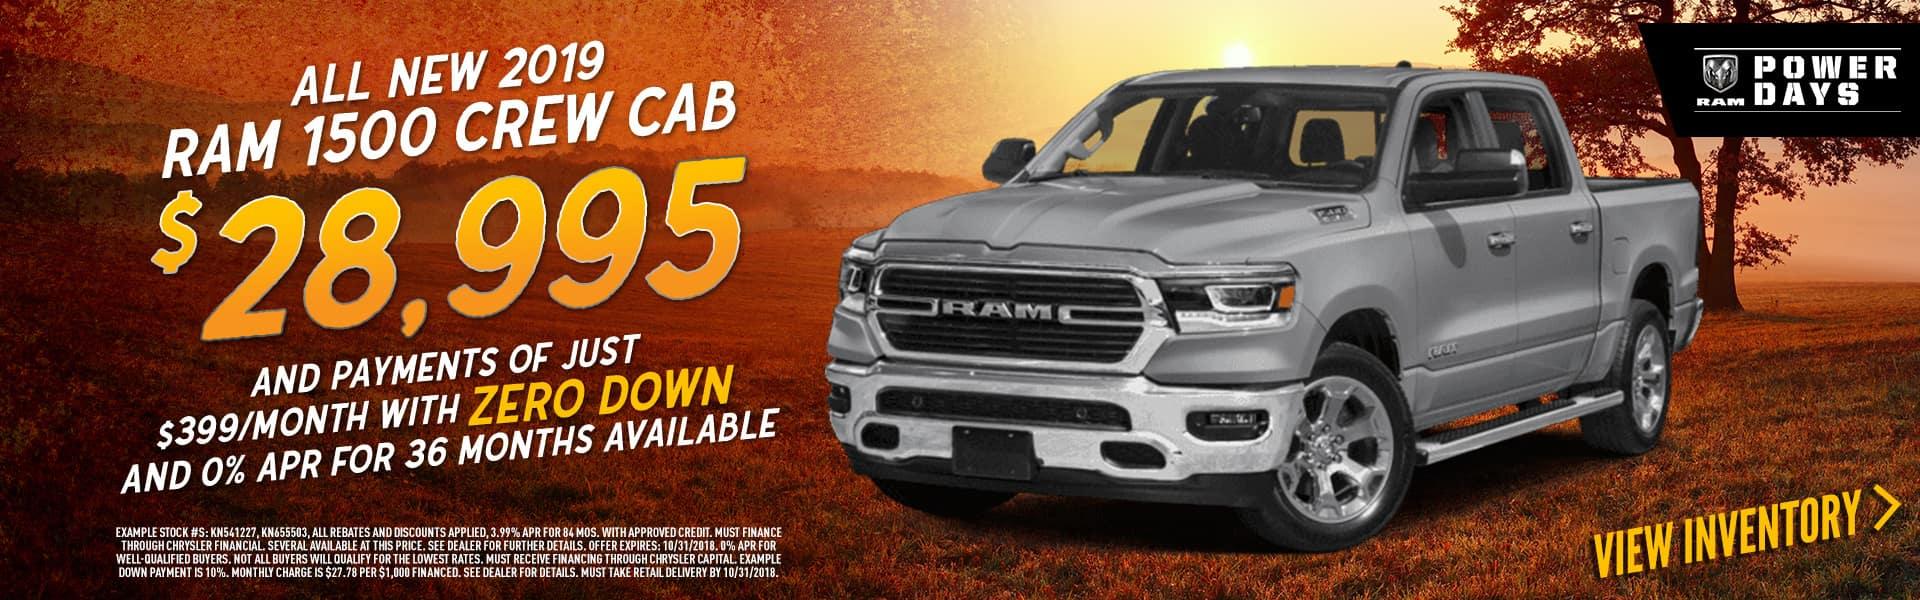 Captivating Bob Howard Chrysler Jeep Dodge RAM. 2019_ram_1500_crew_cab.  2019_jeep_cherokee_latitude_plus